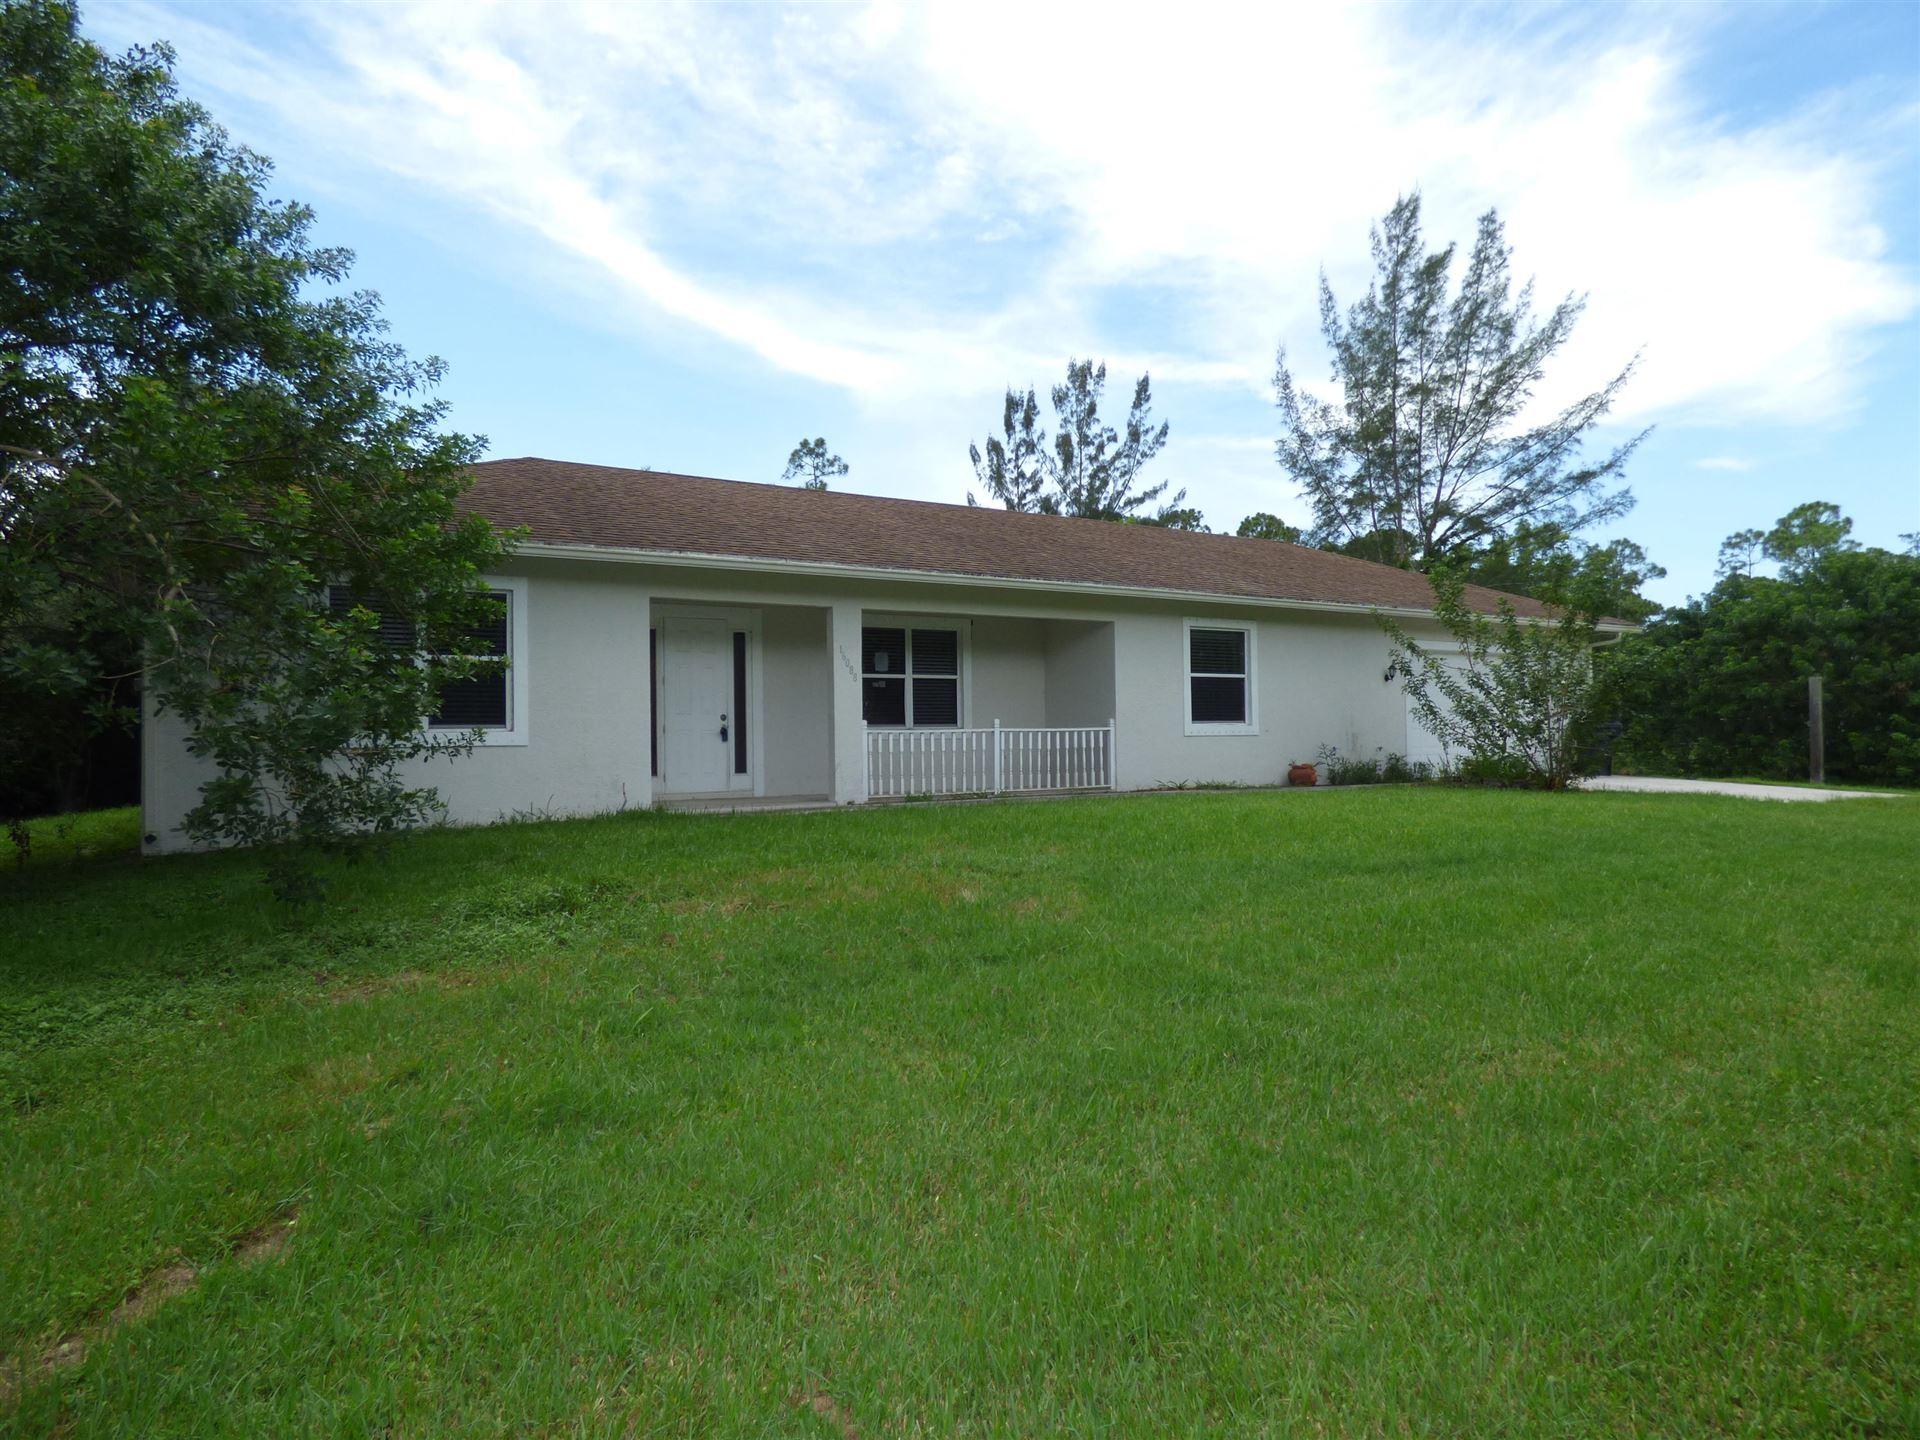 Photo of 16088 E Downers Drive E, Loxahatchee, FL 33470 (MLS # RX-10646964)